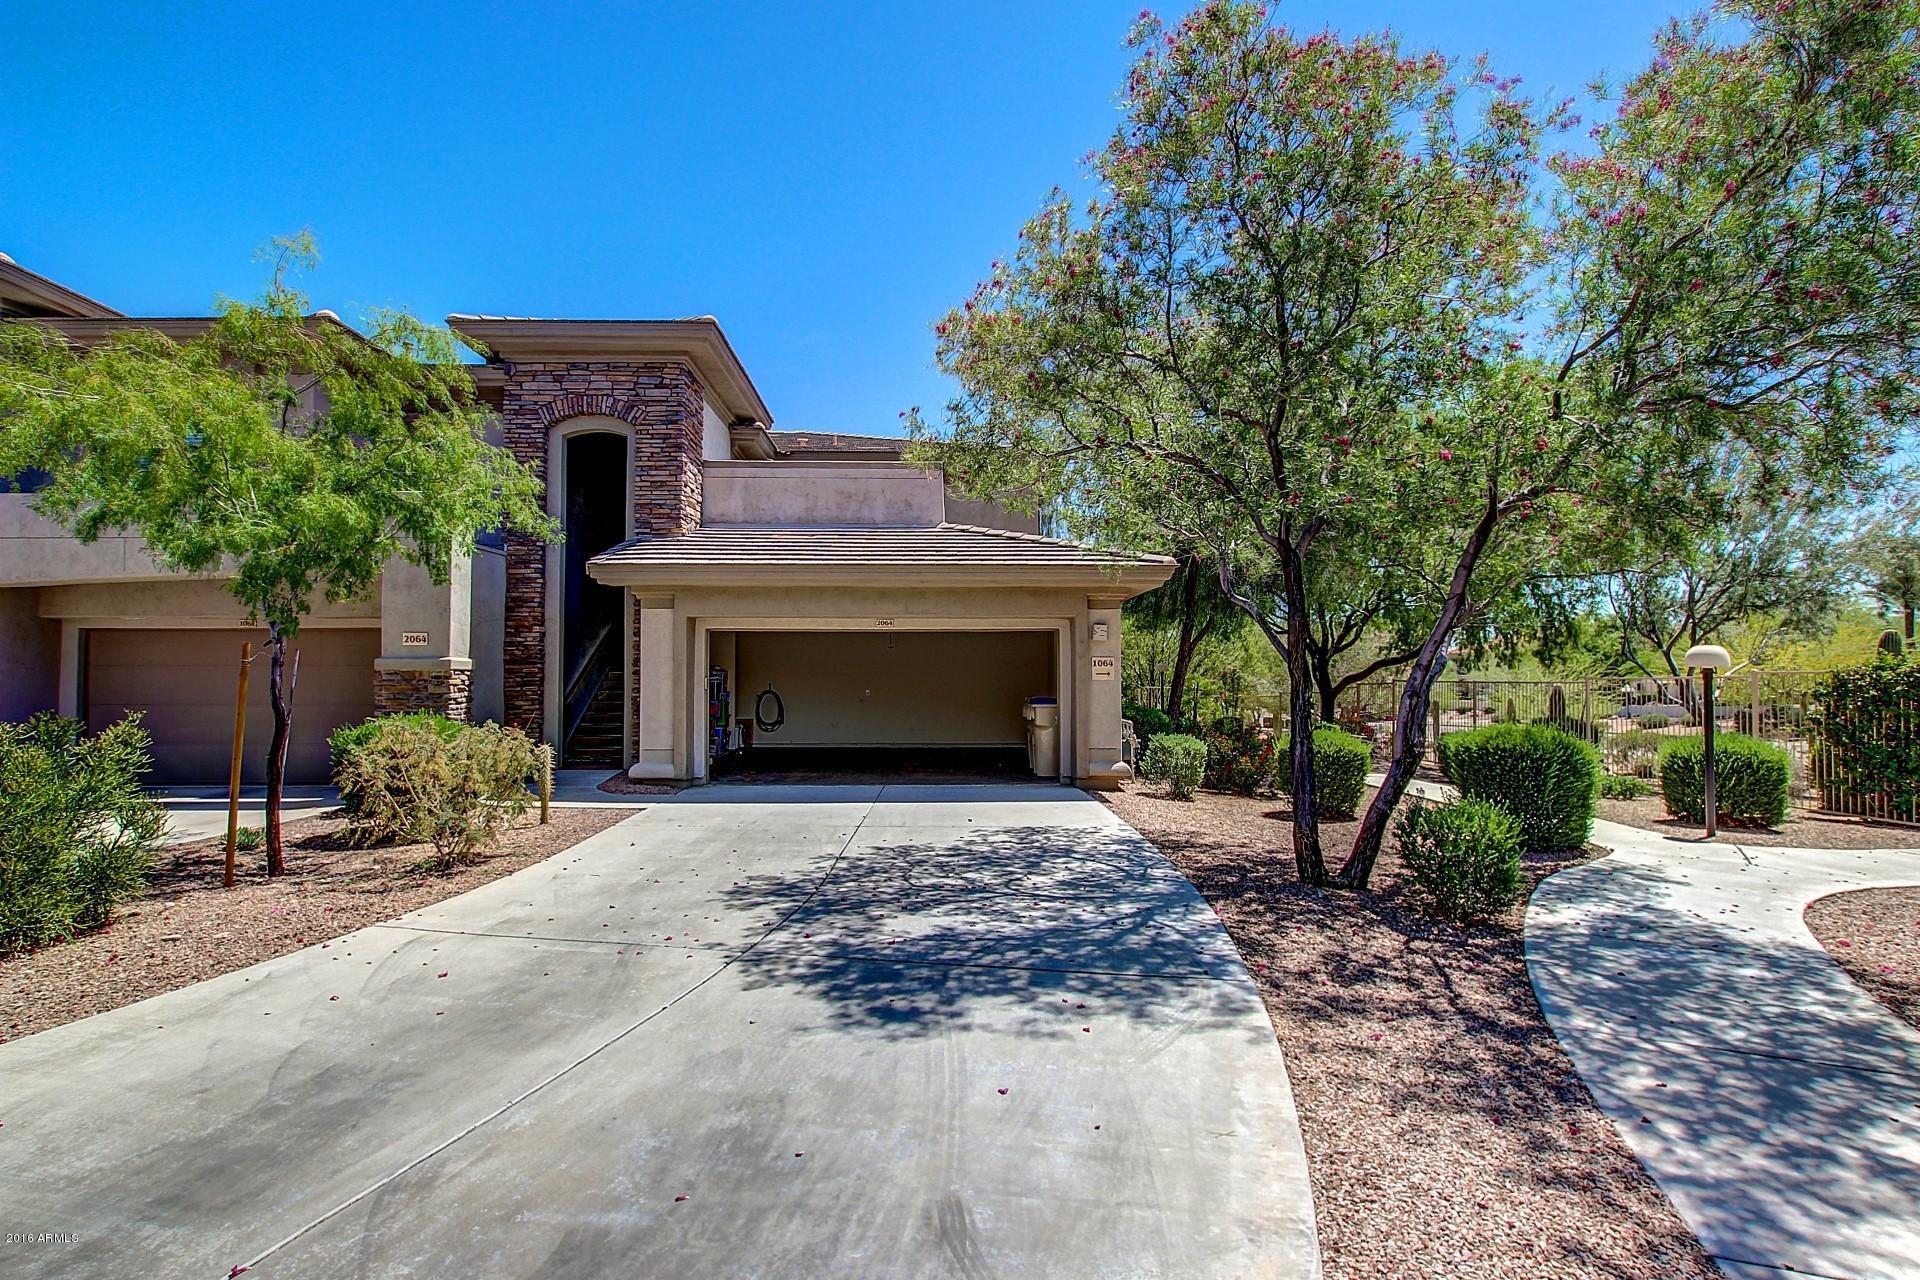 16800 E El Lago Boulevard, Unit 2064, Fountain Hills AZ 85268 - Photo 2